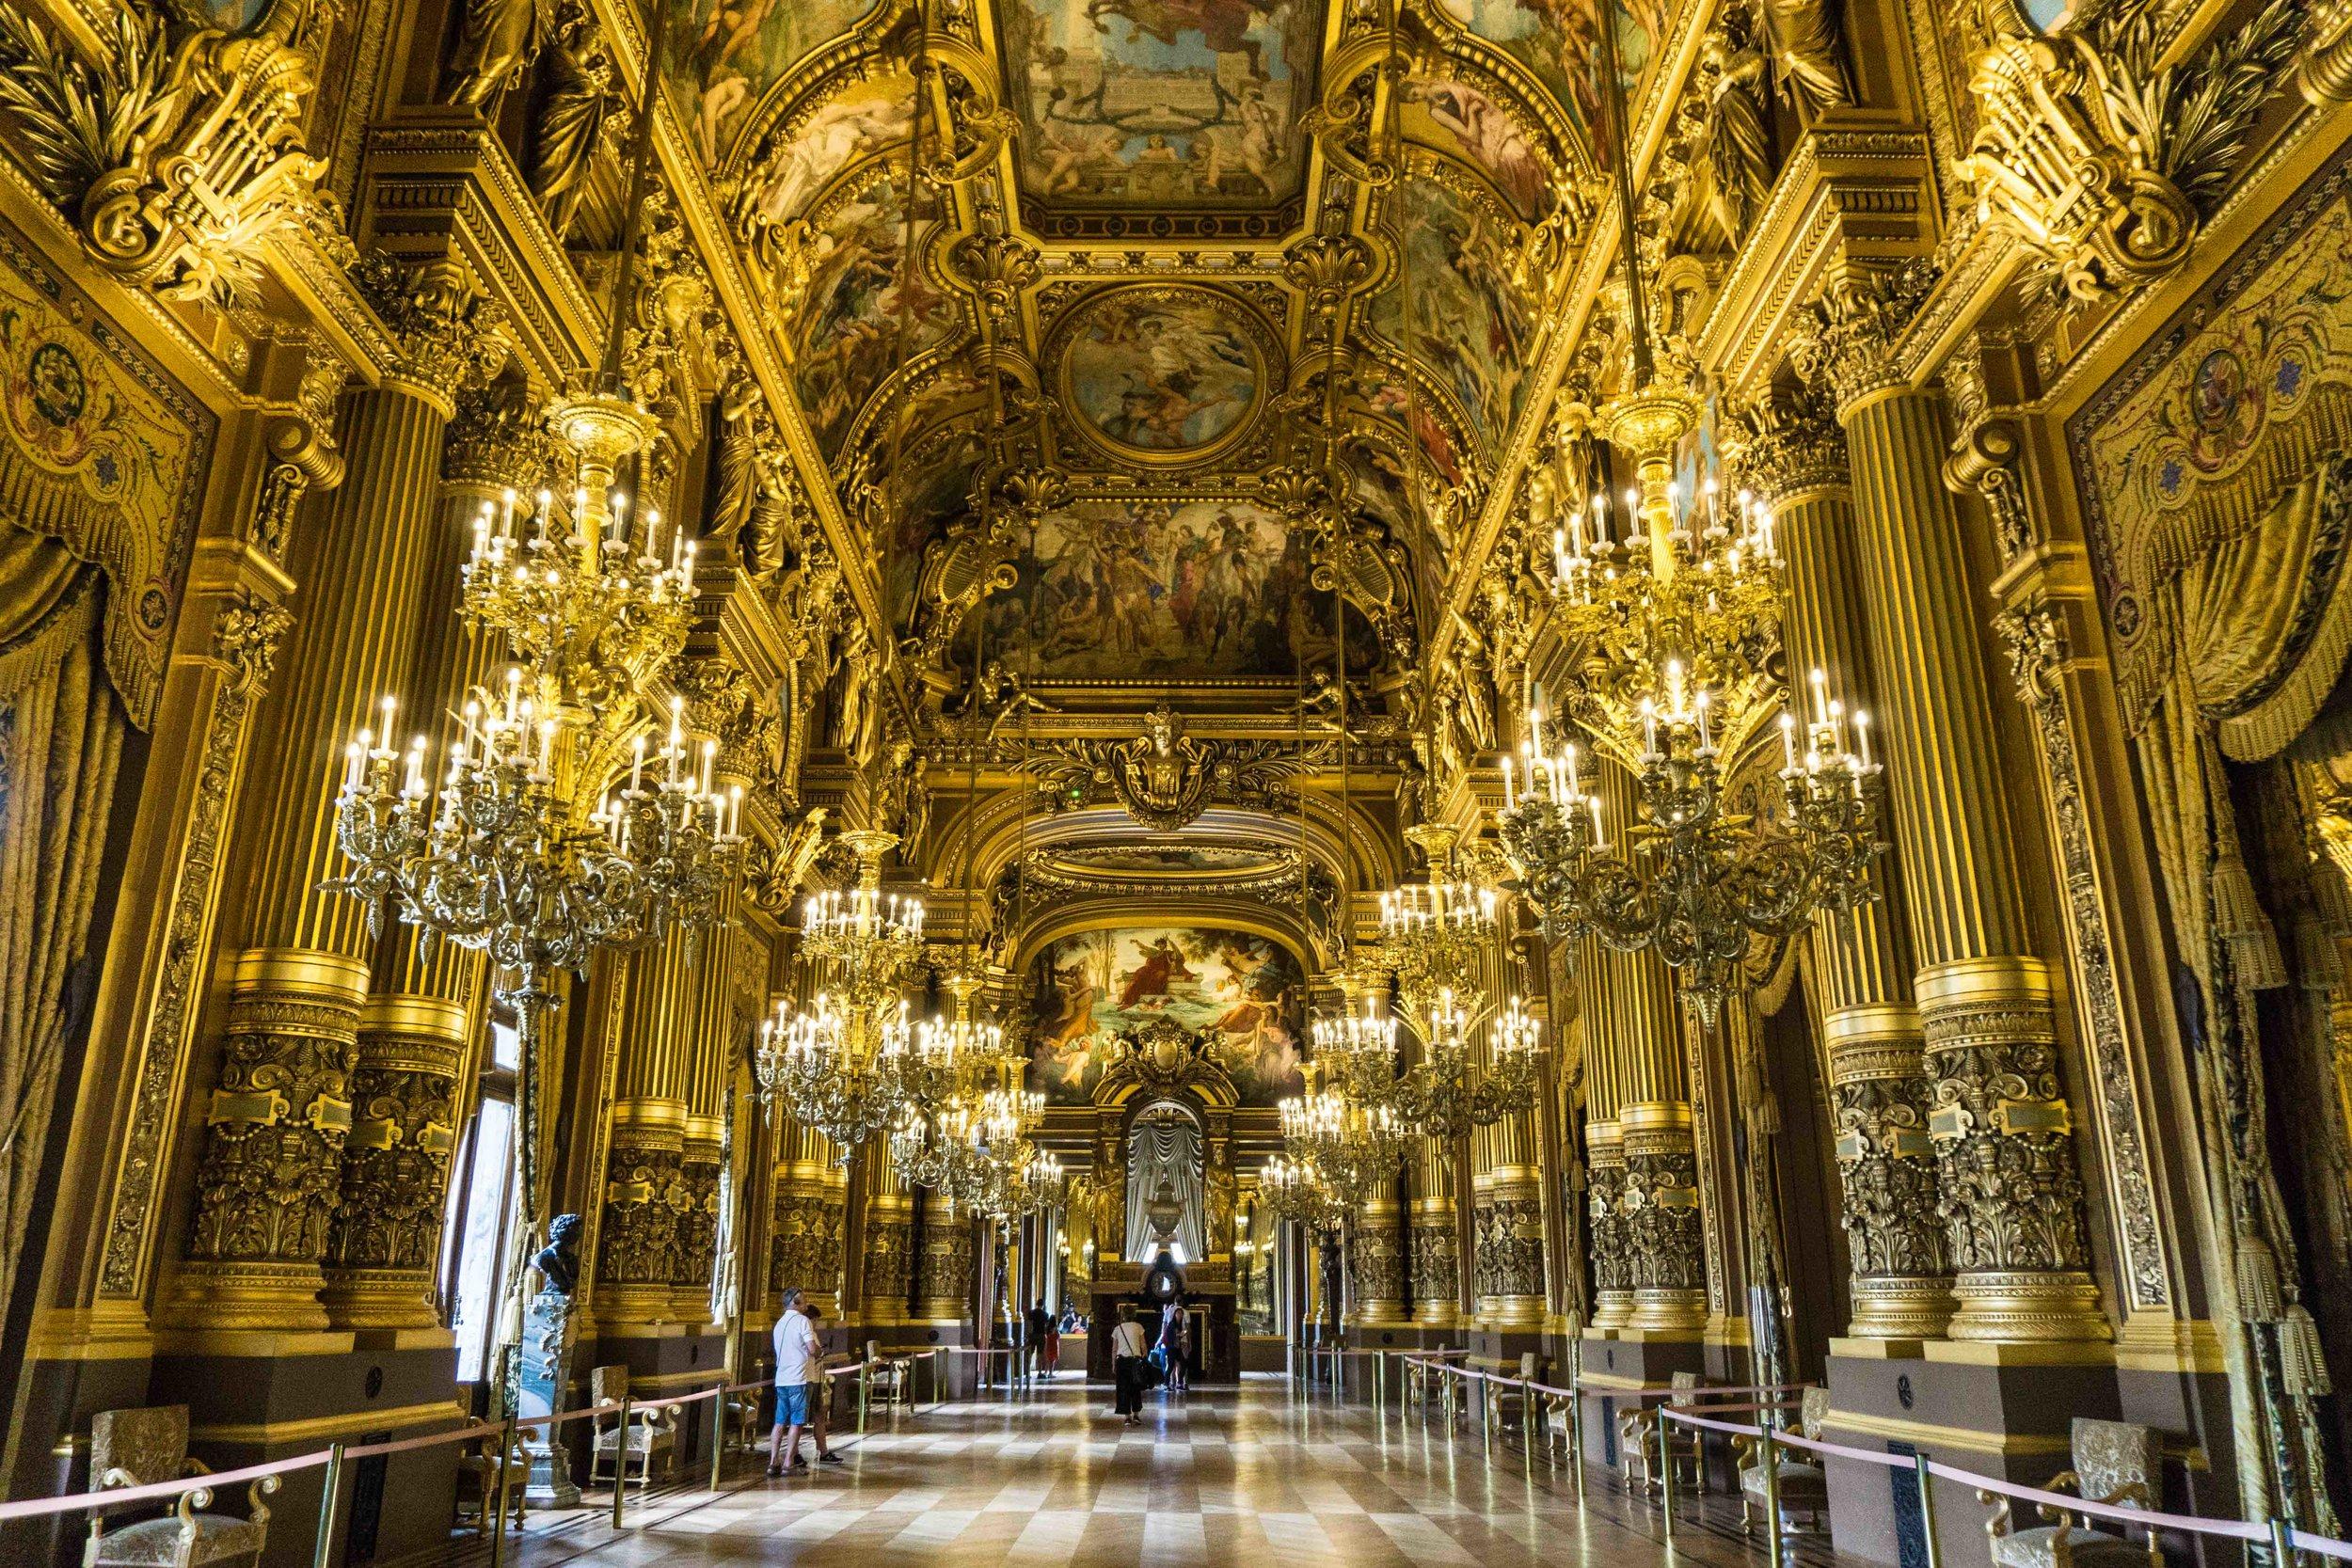 Waaaay more opulent than Versailles